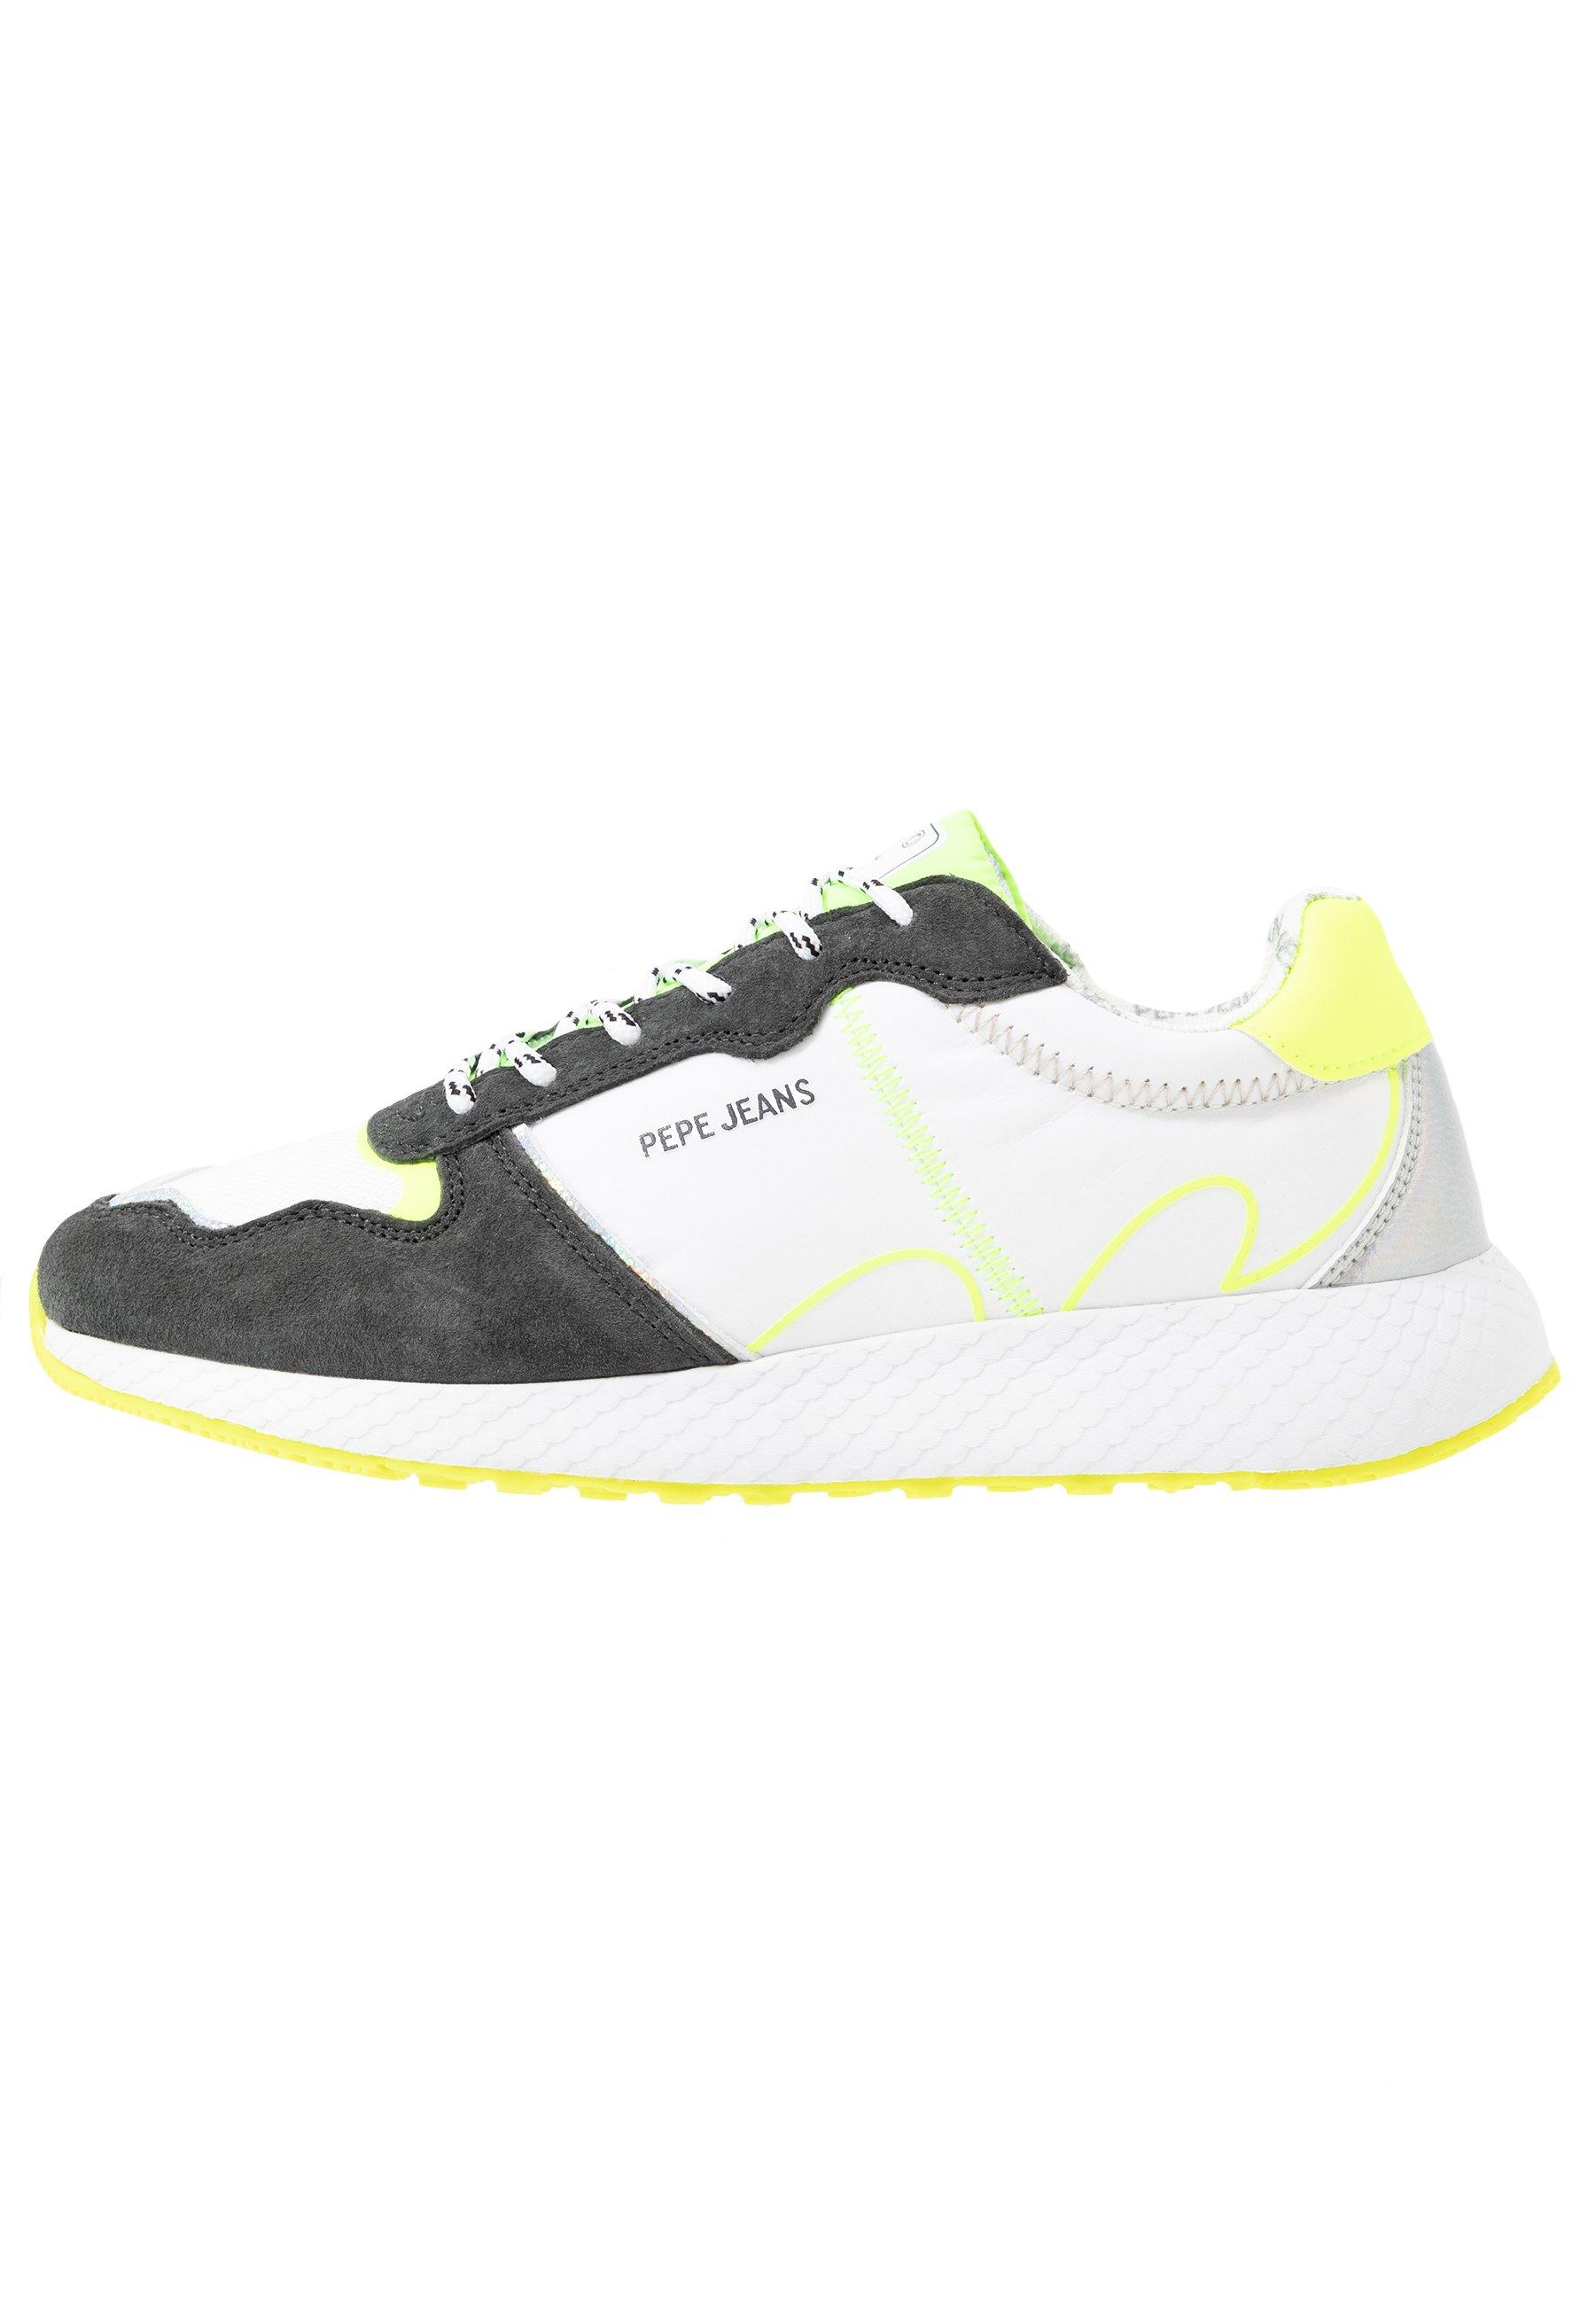 Pepe Jeans Koko Tech - Sneaker Low Neon Yellow Black Friday